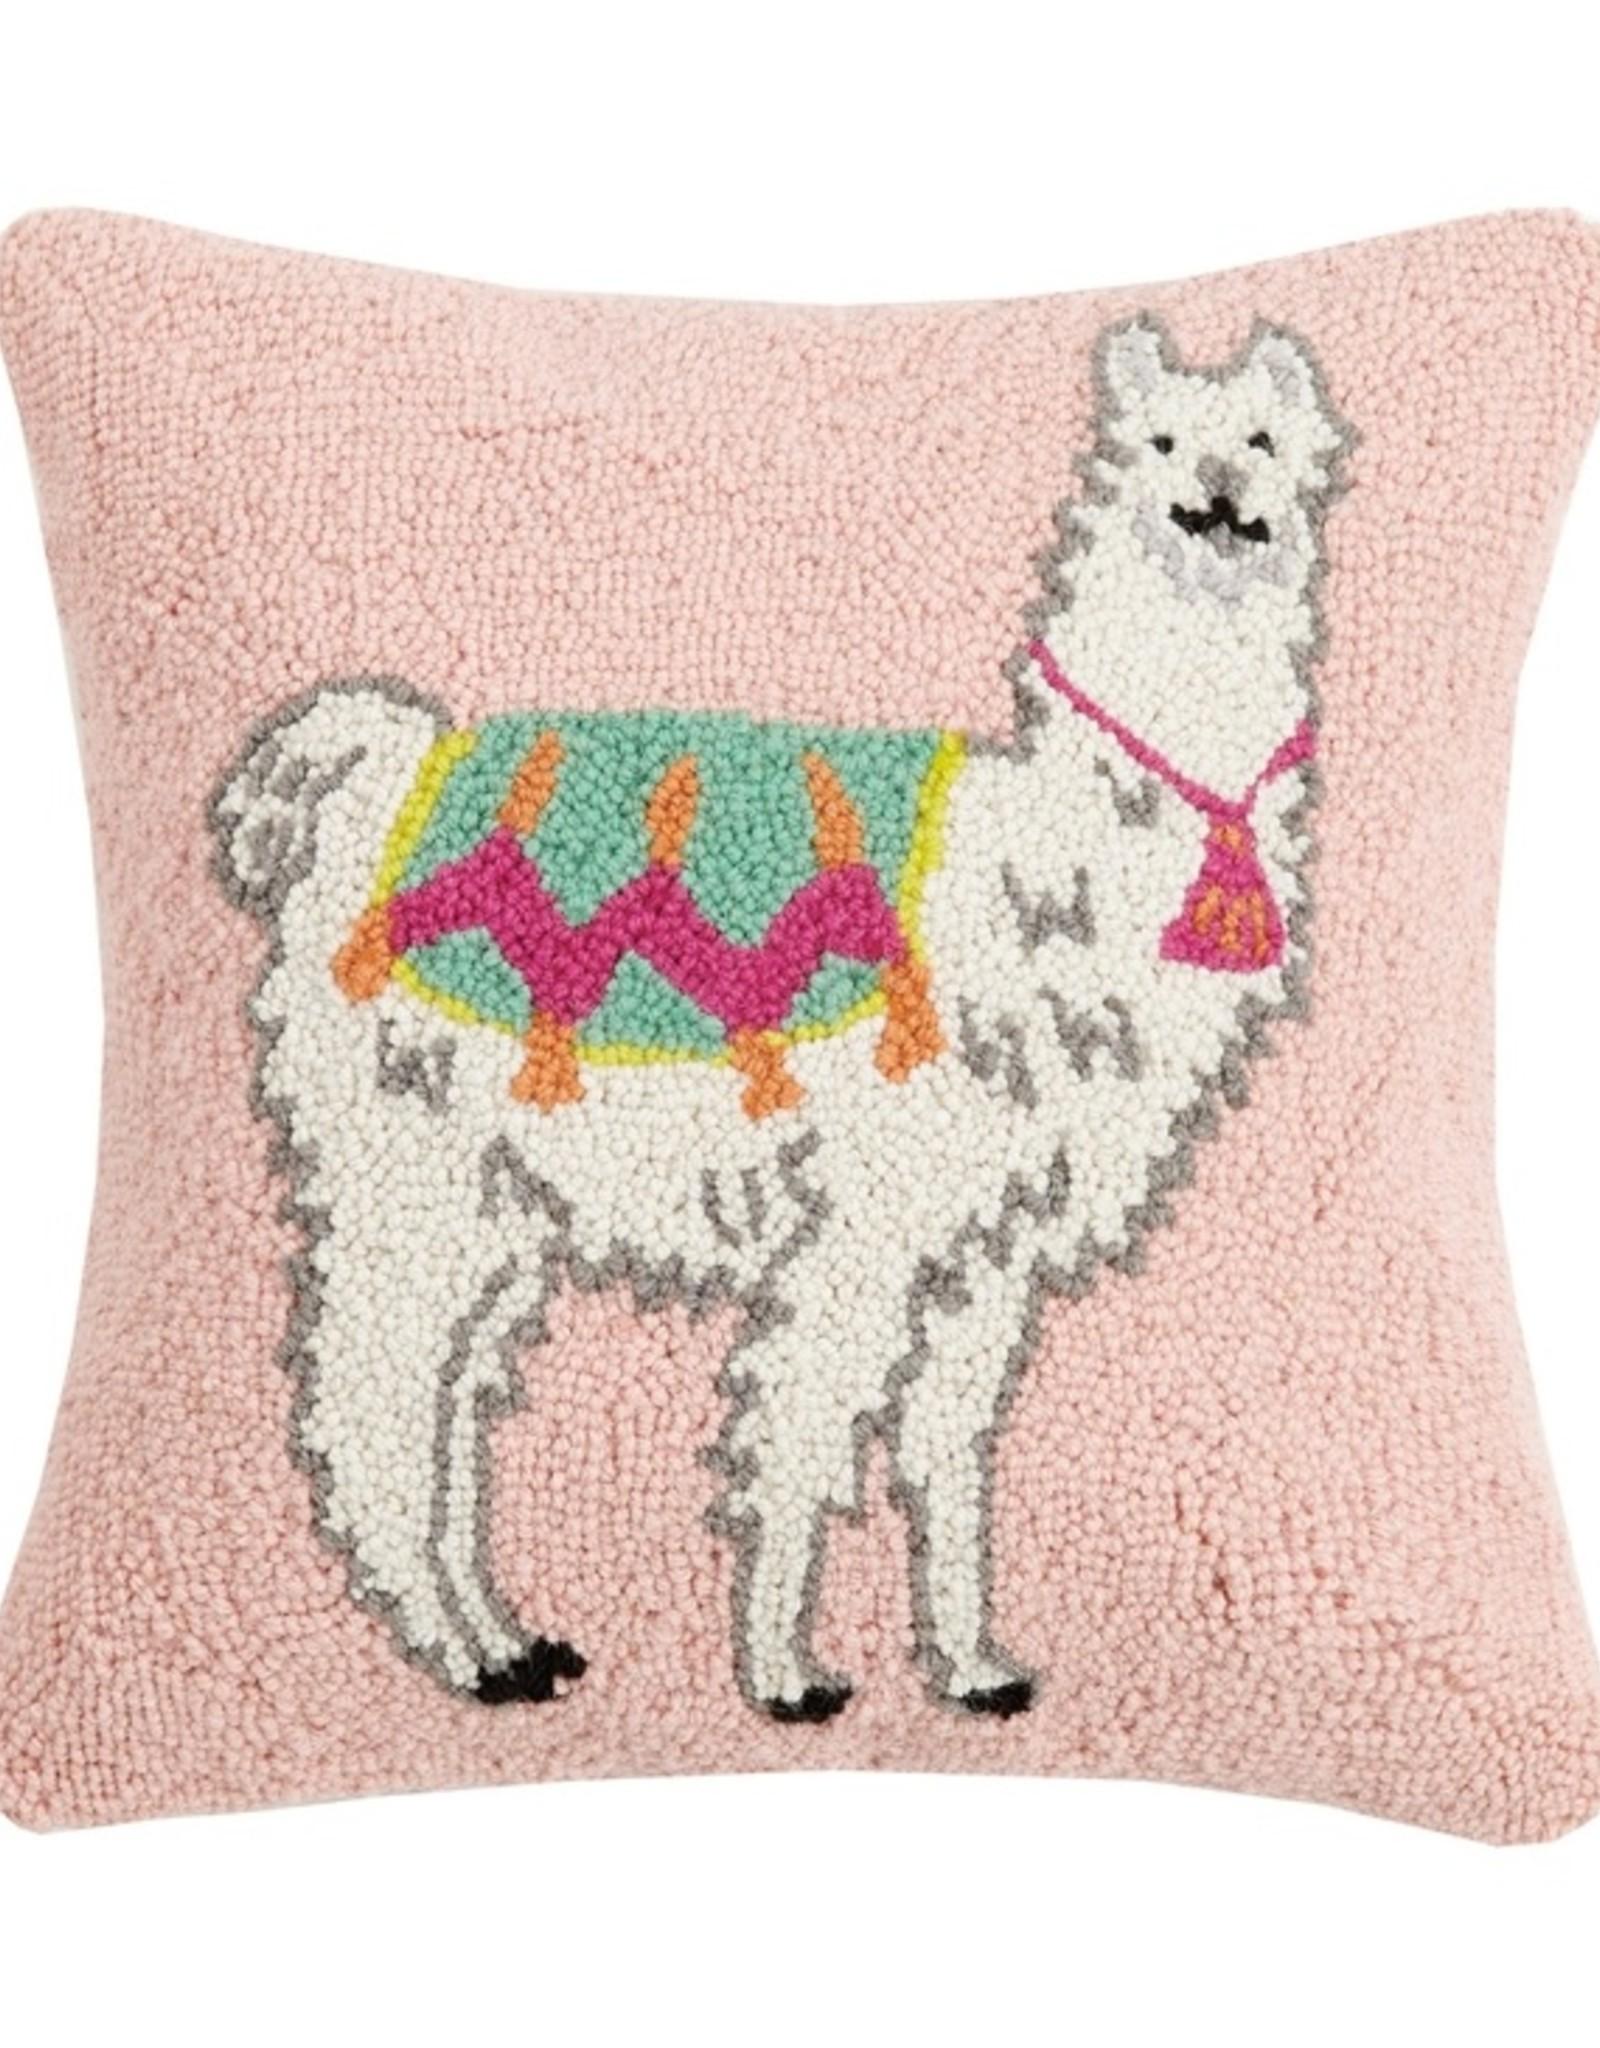 Peking Handicraft Llama New Festival Hook Pillow